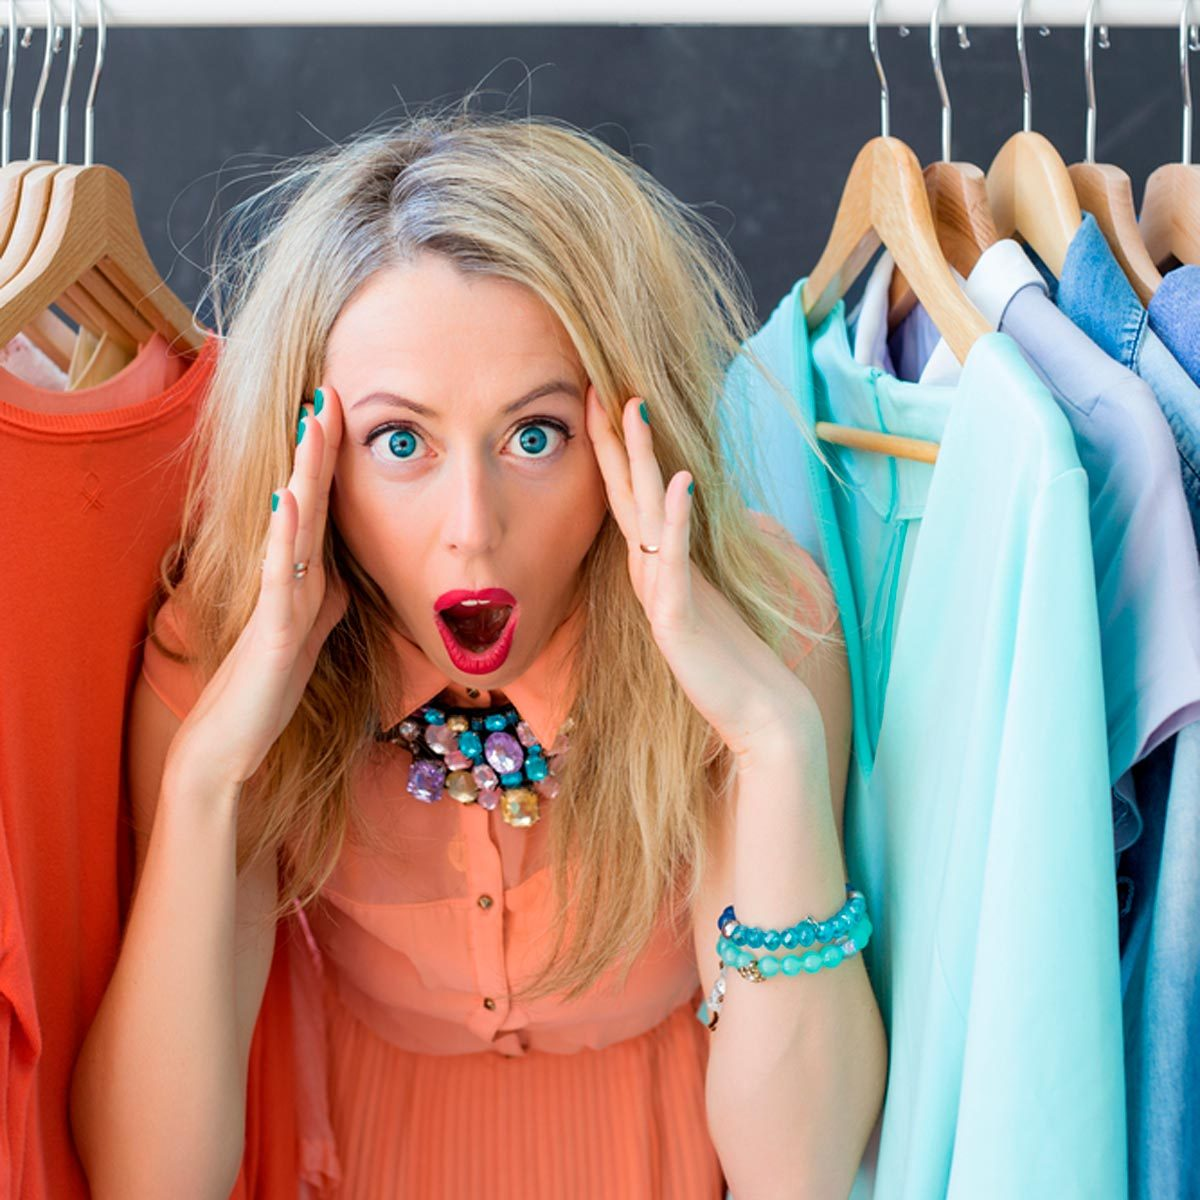 how to organize a closet like a pro | family handyman